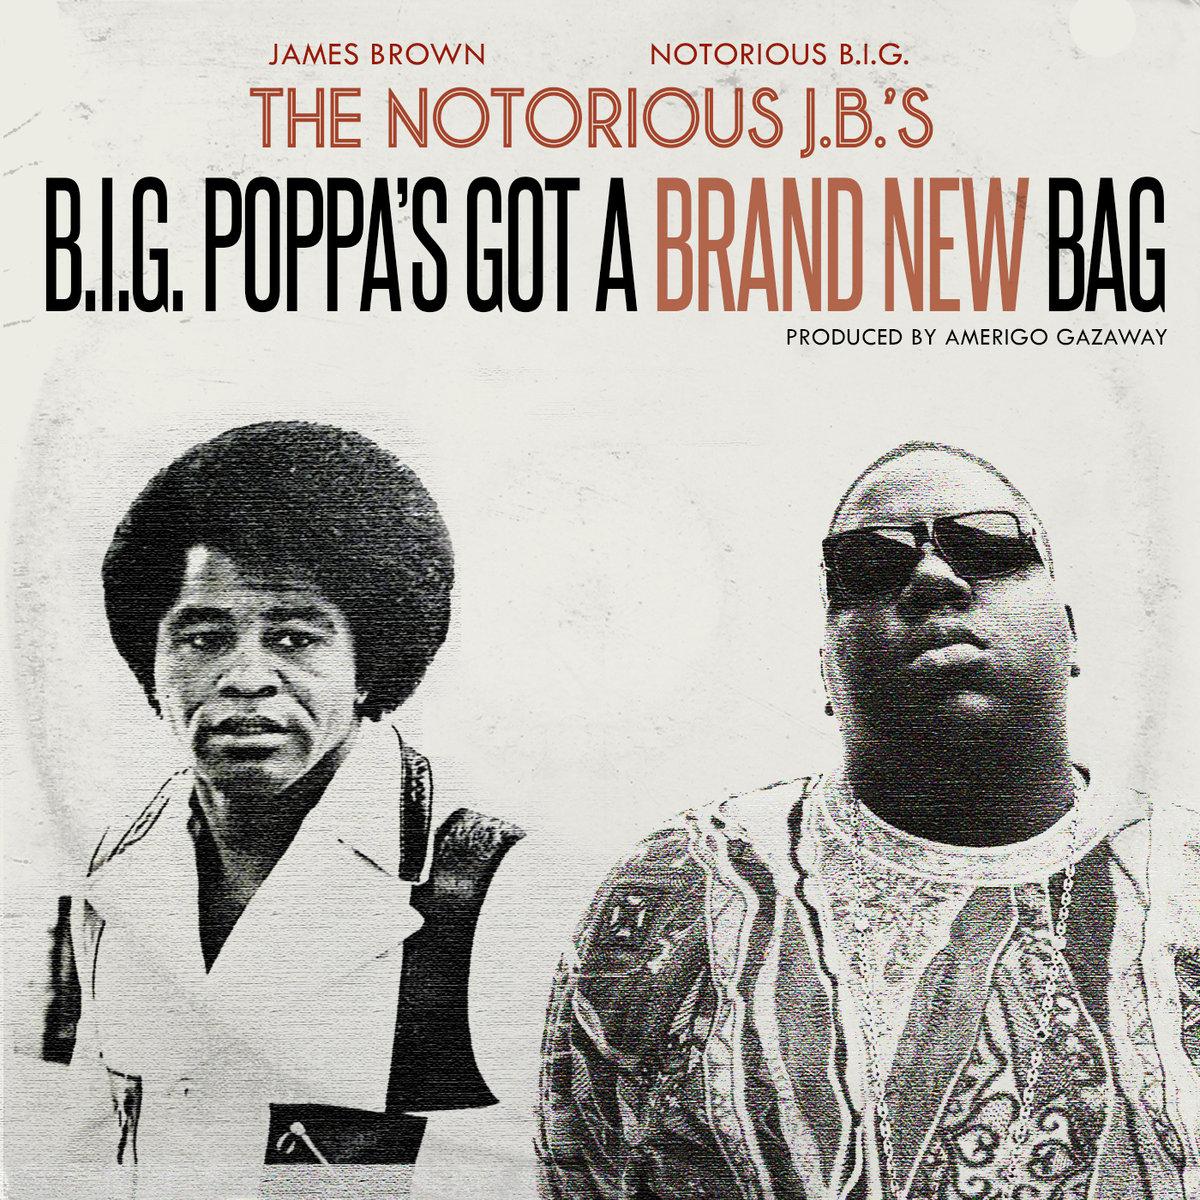 Amerigo Gazaway «The Notorious J.B.'s — B.I.G. Poppa's Got A Brand New Bag»